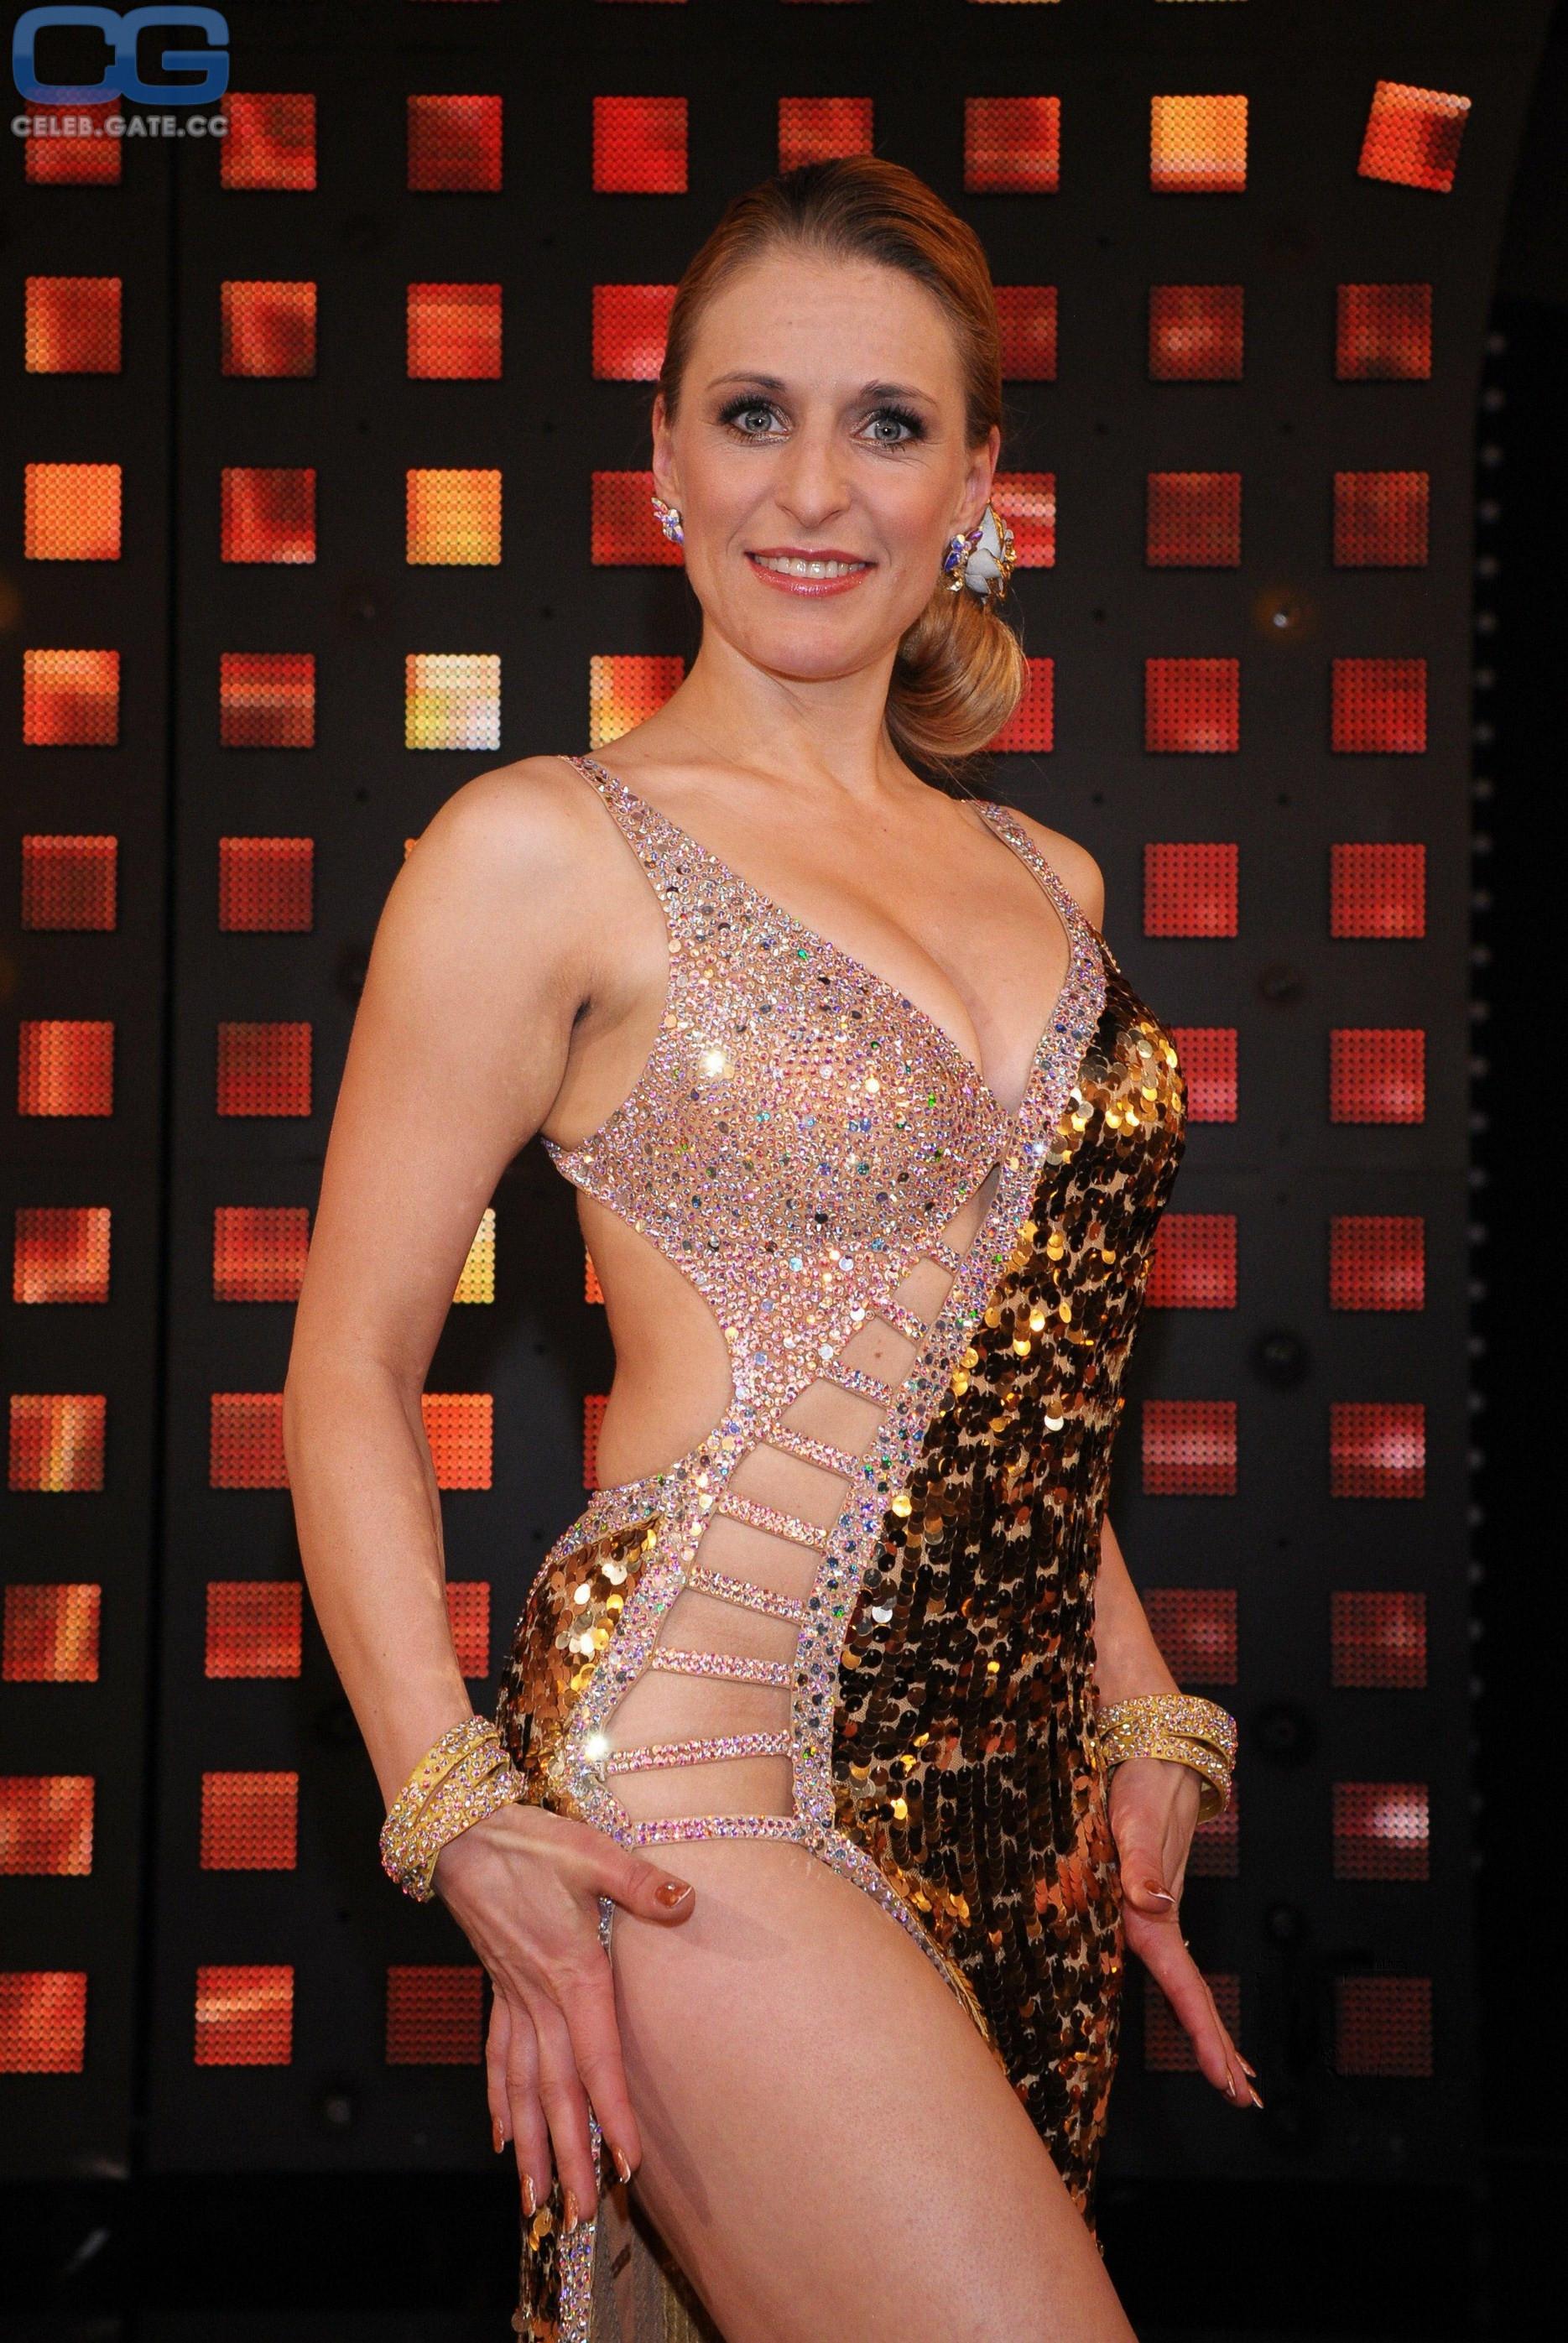 Stefanie hertel naked